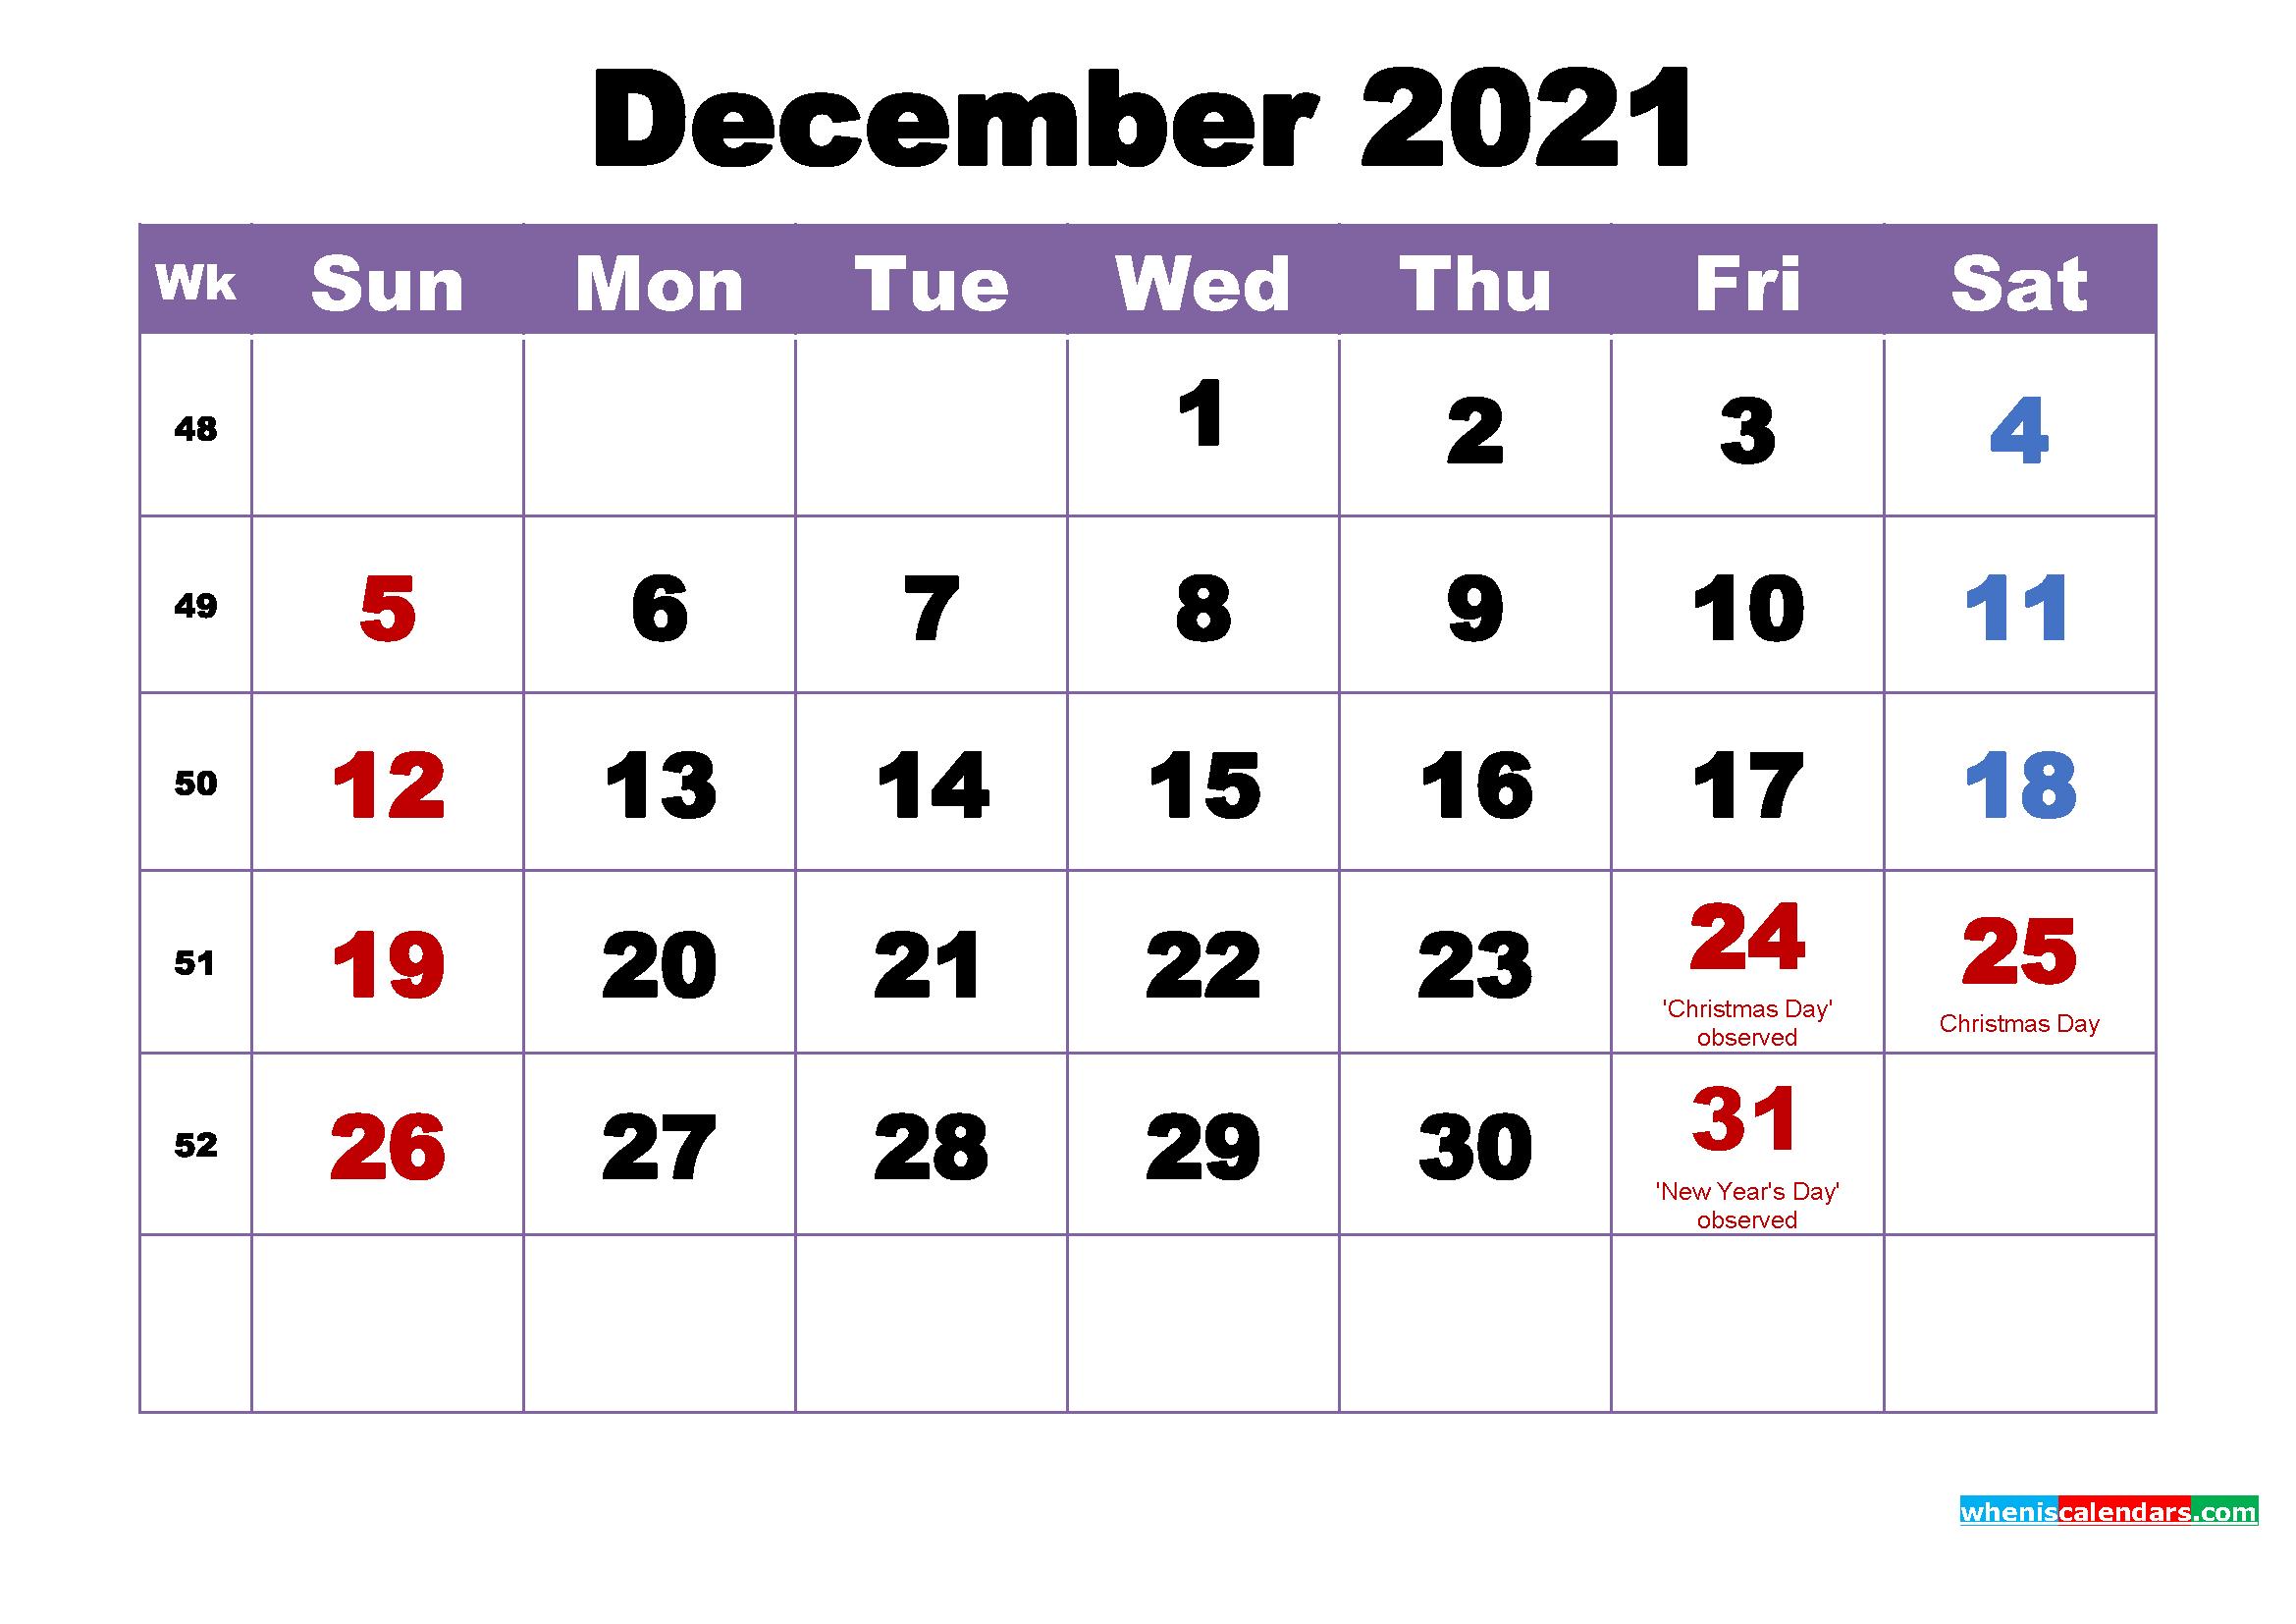 December 2021 Printable Calendar With Holidays Word, Pdf